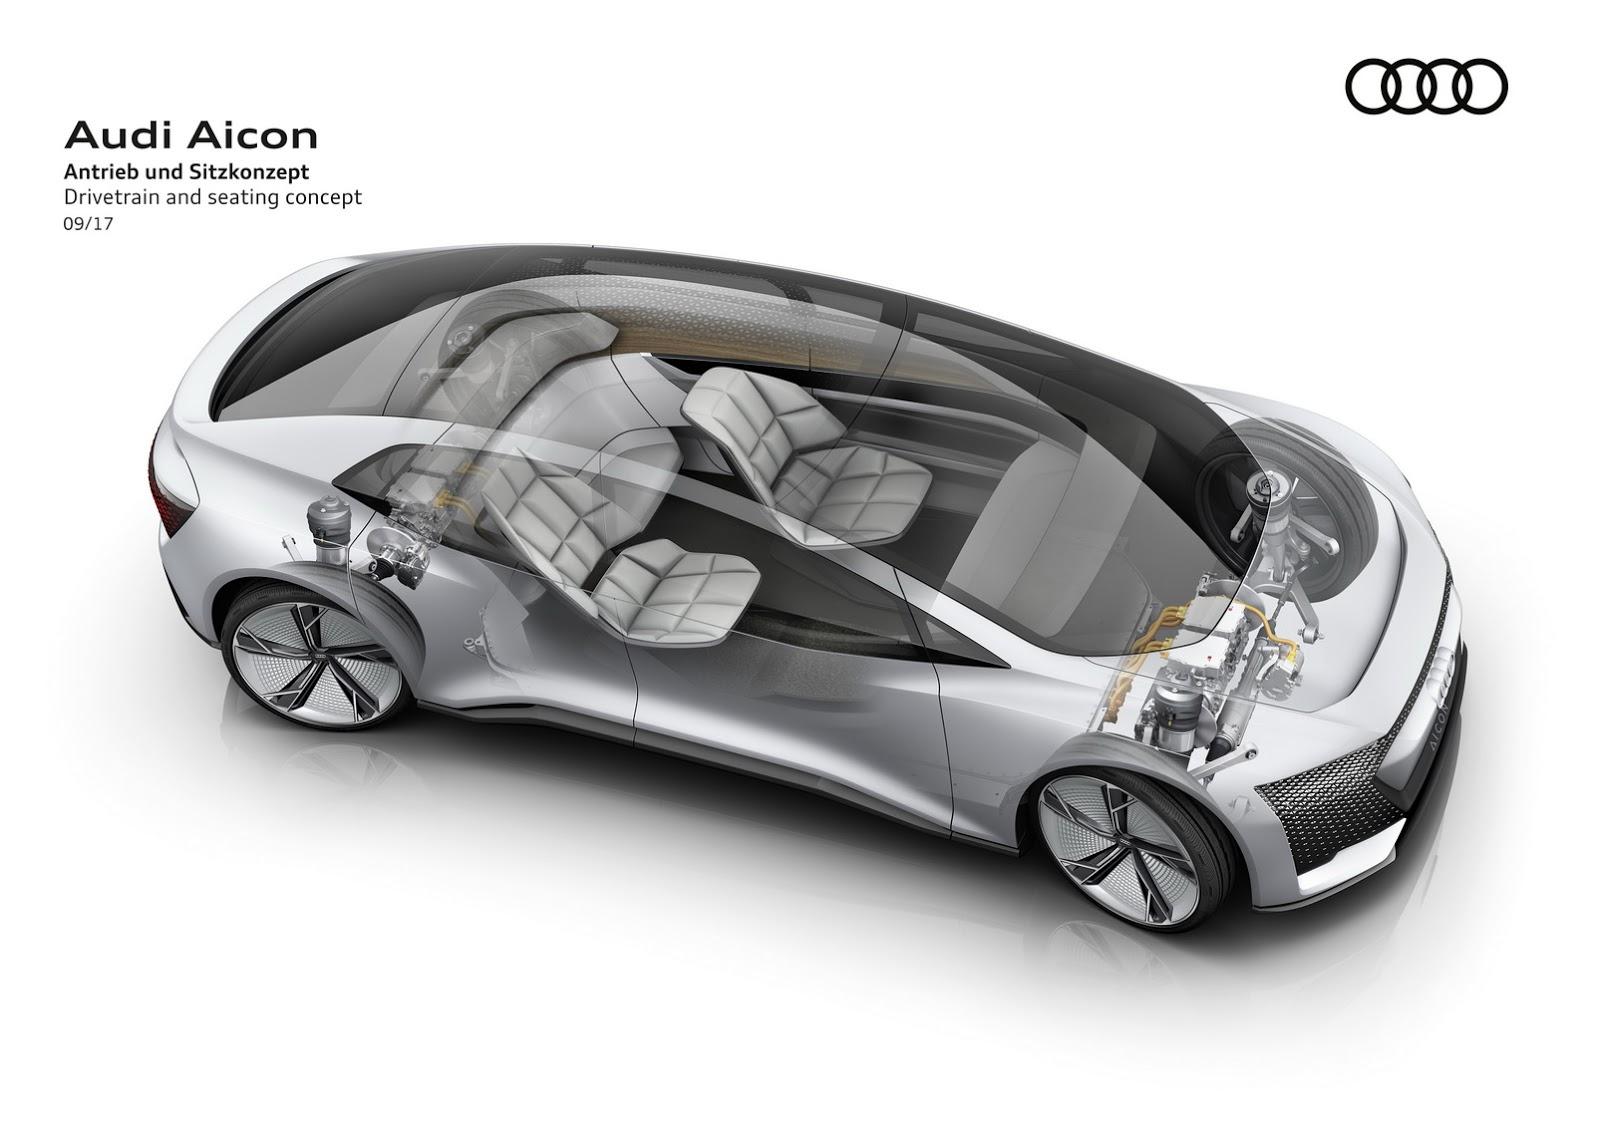 audi-aircon-frankfurt-concept-48